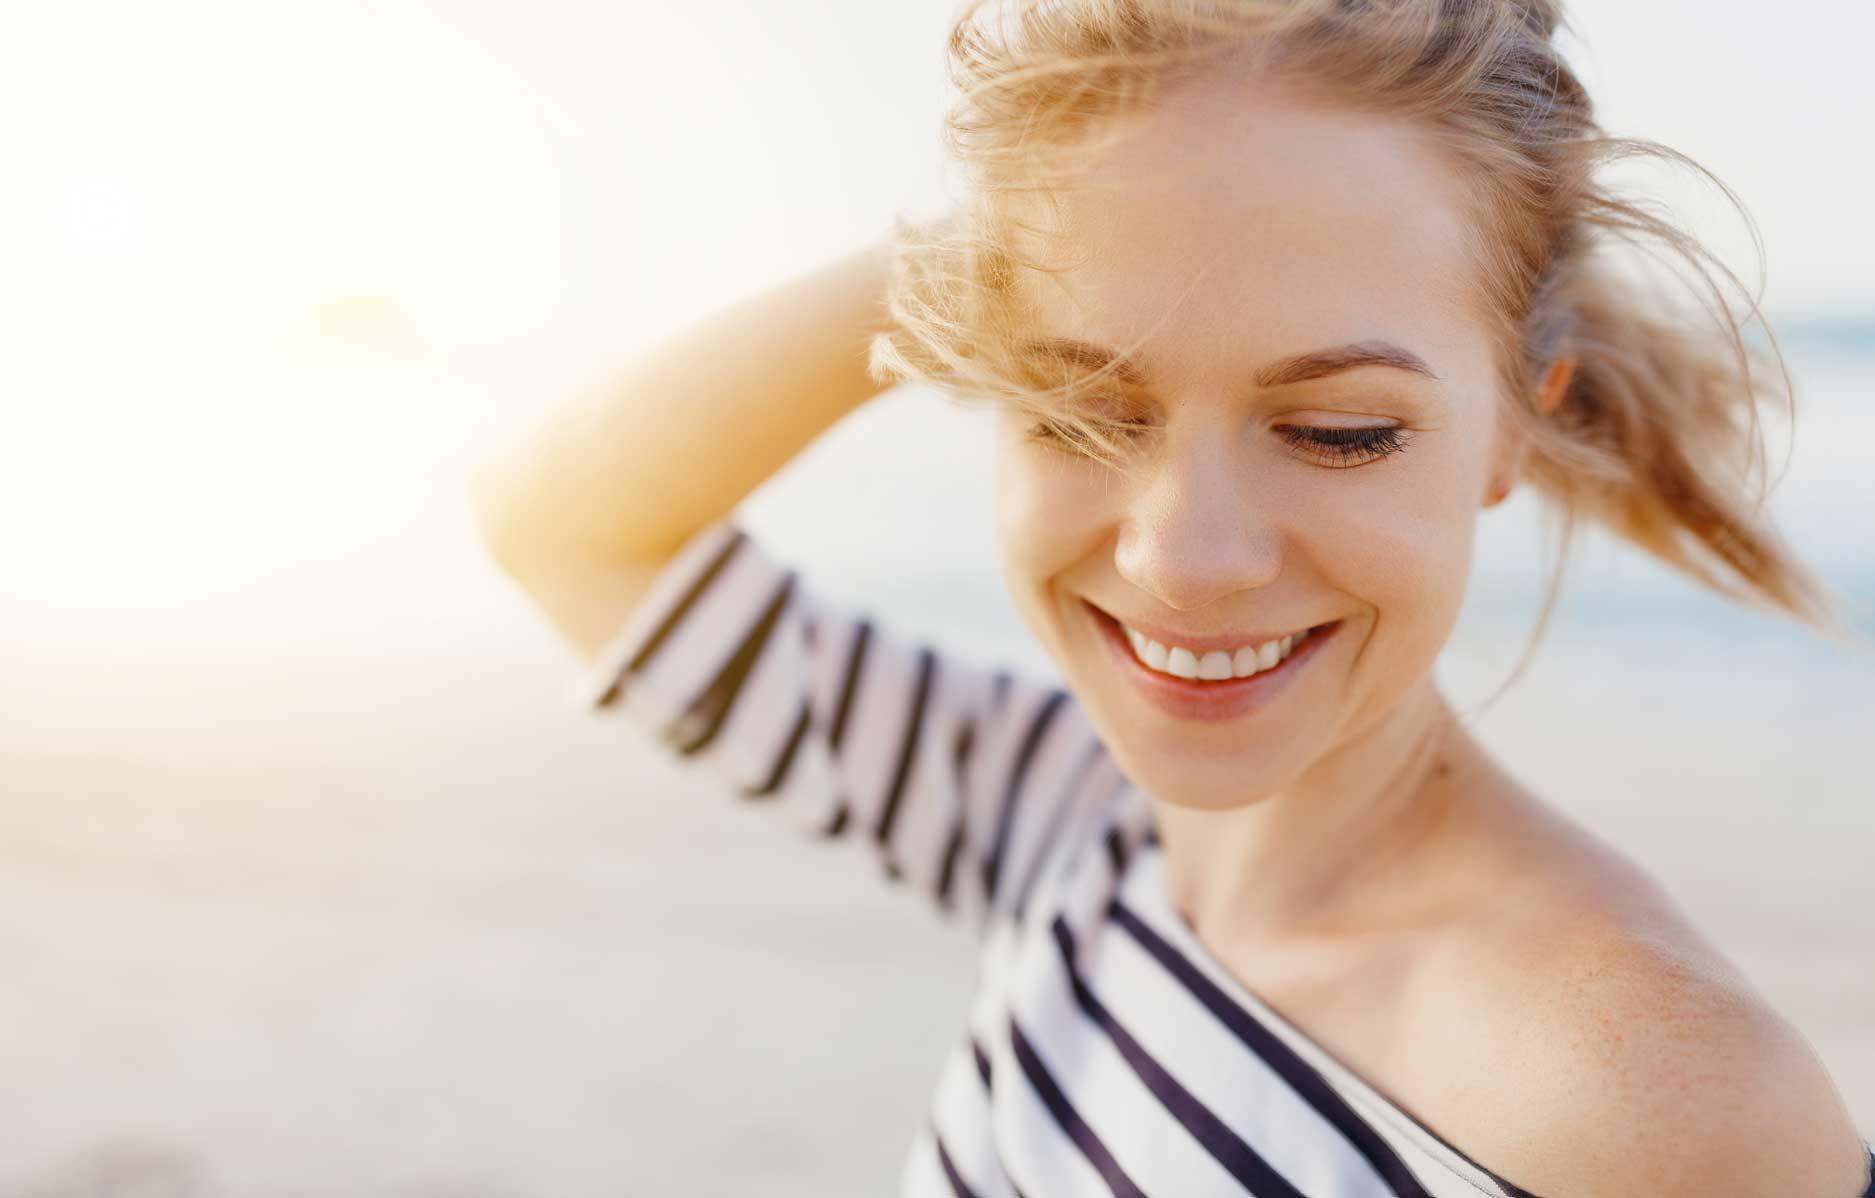 How Can My Oral Hygiene Affect My Overall Health? | Avalon Dental, your Carson and El Segundo Dentist